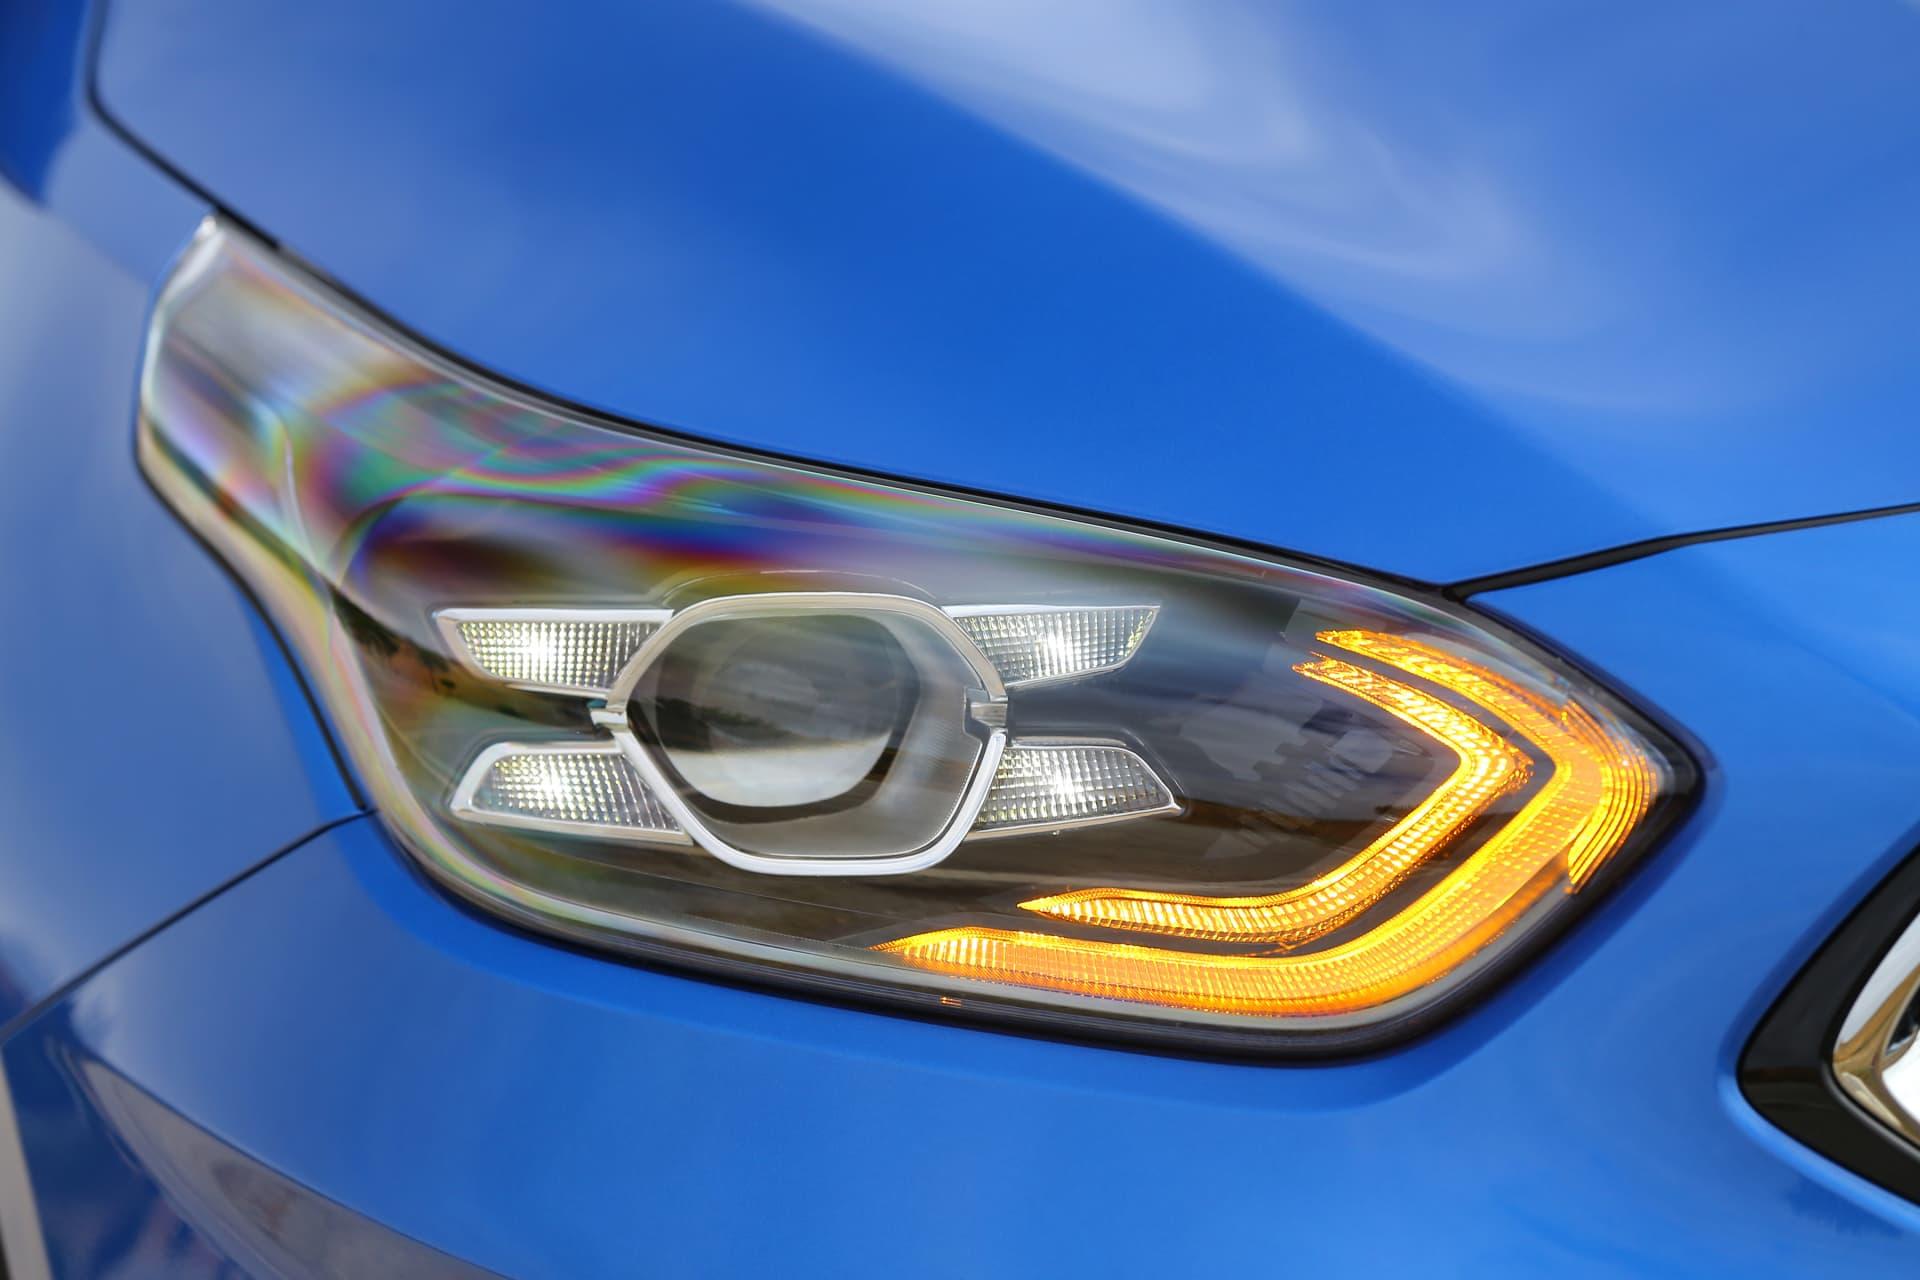 Kia Ceed 1 6 Crdi 6mt Transmission 136hp Blue Flame 36